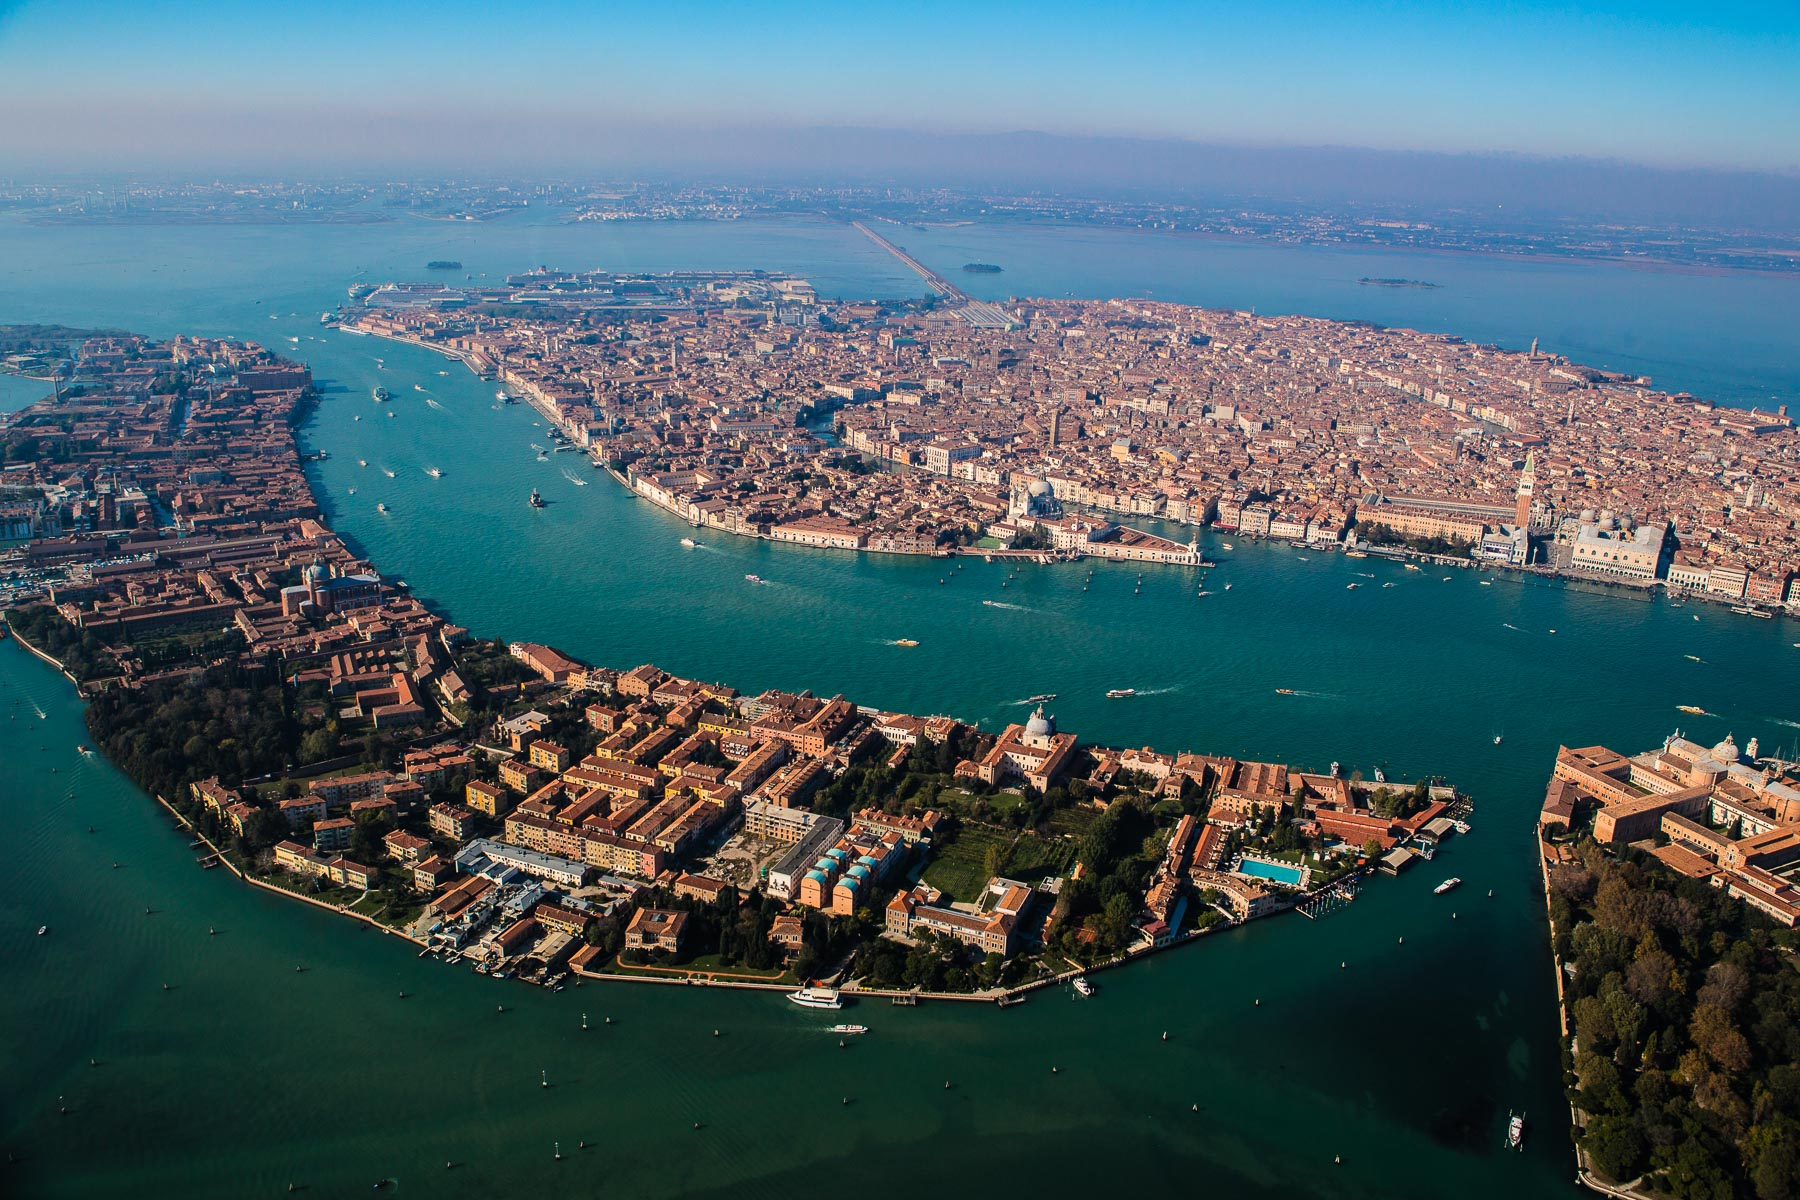 Venice, October 24, 2012